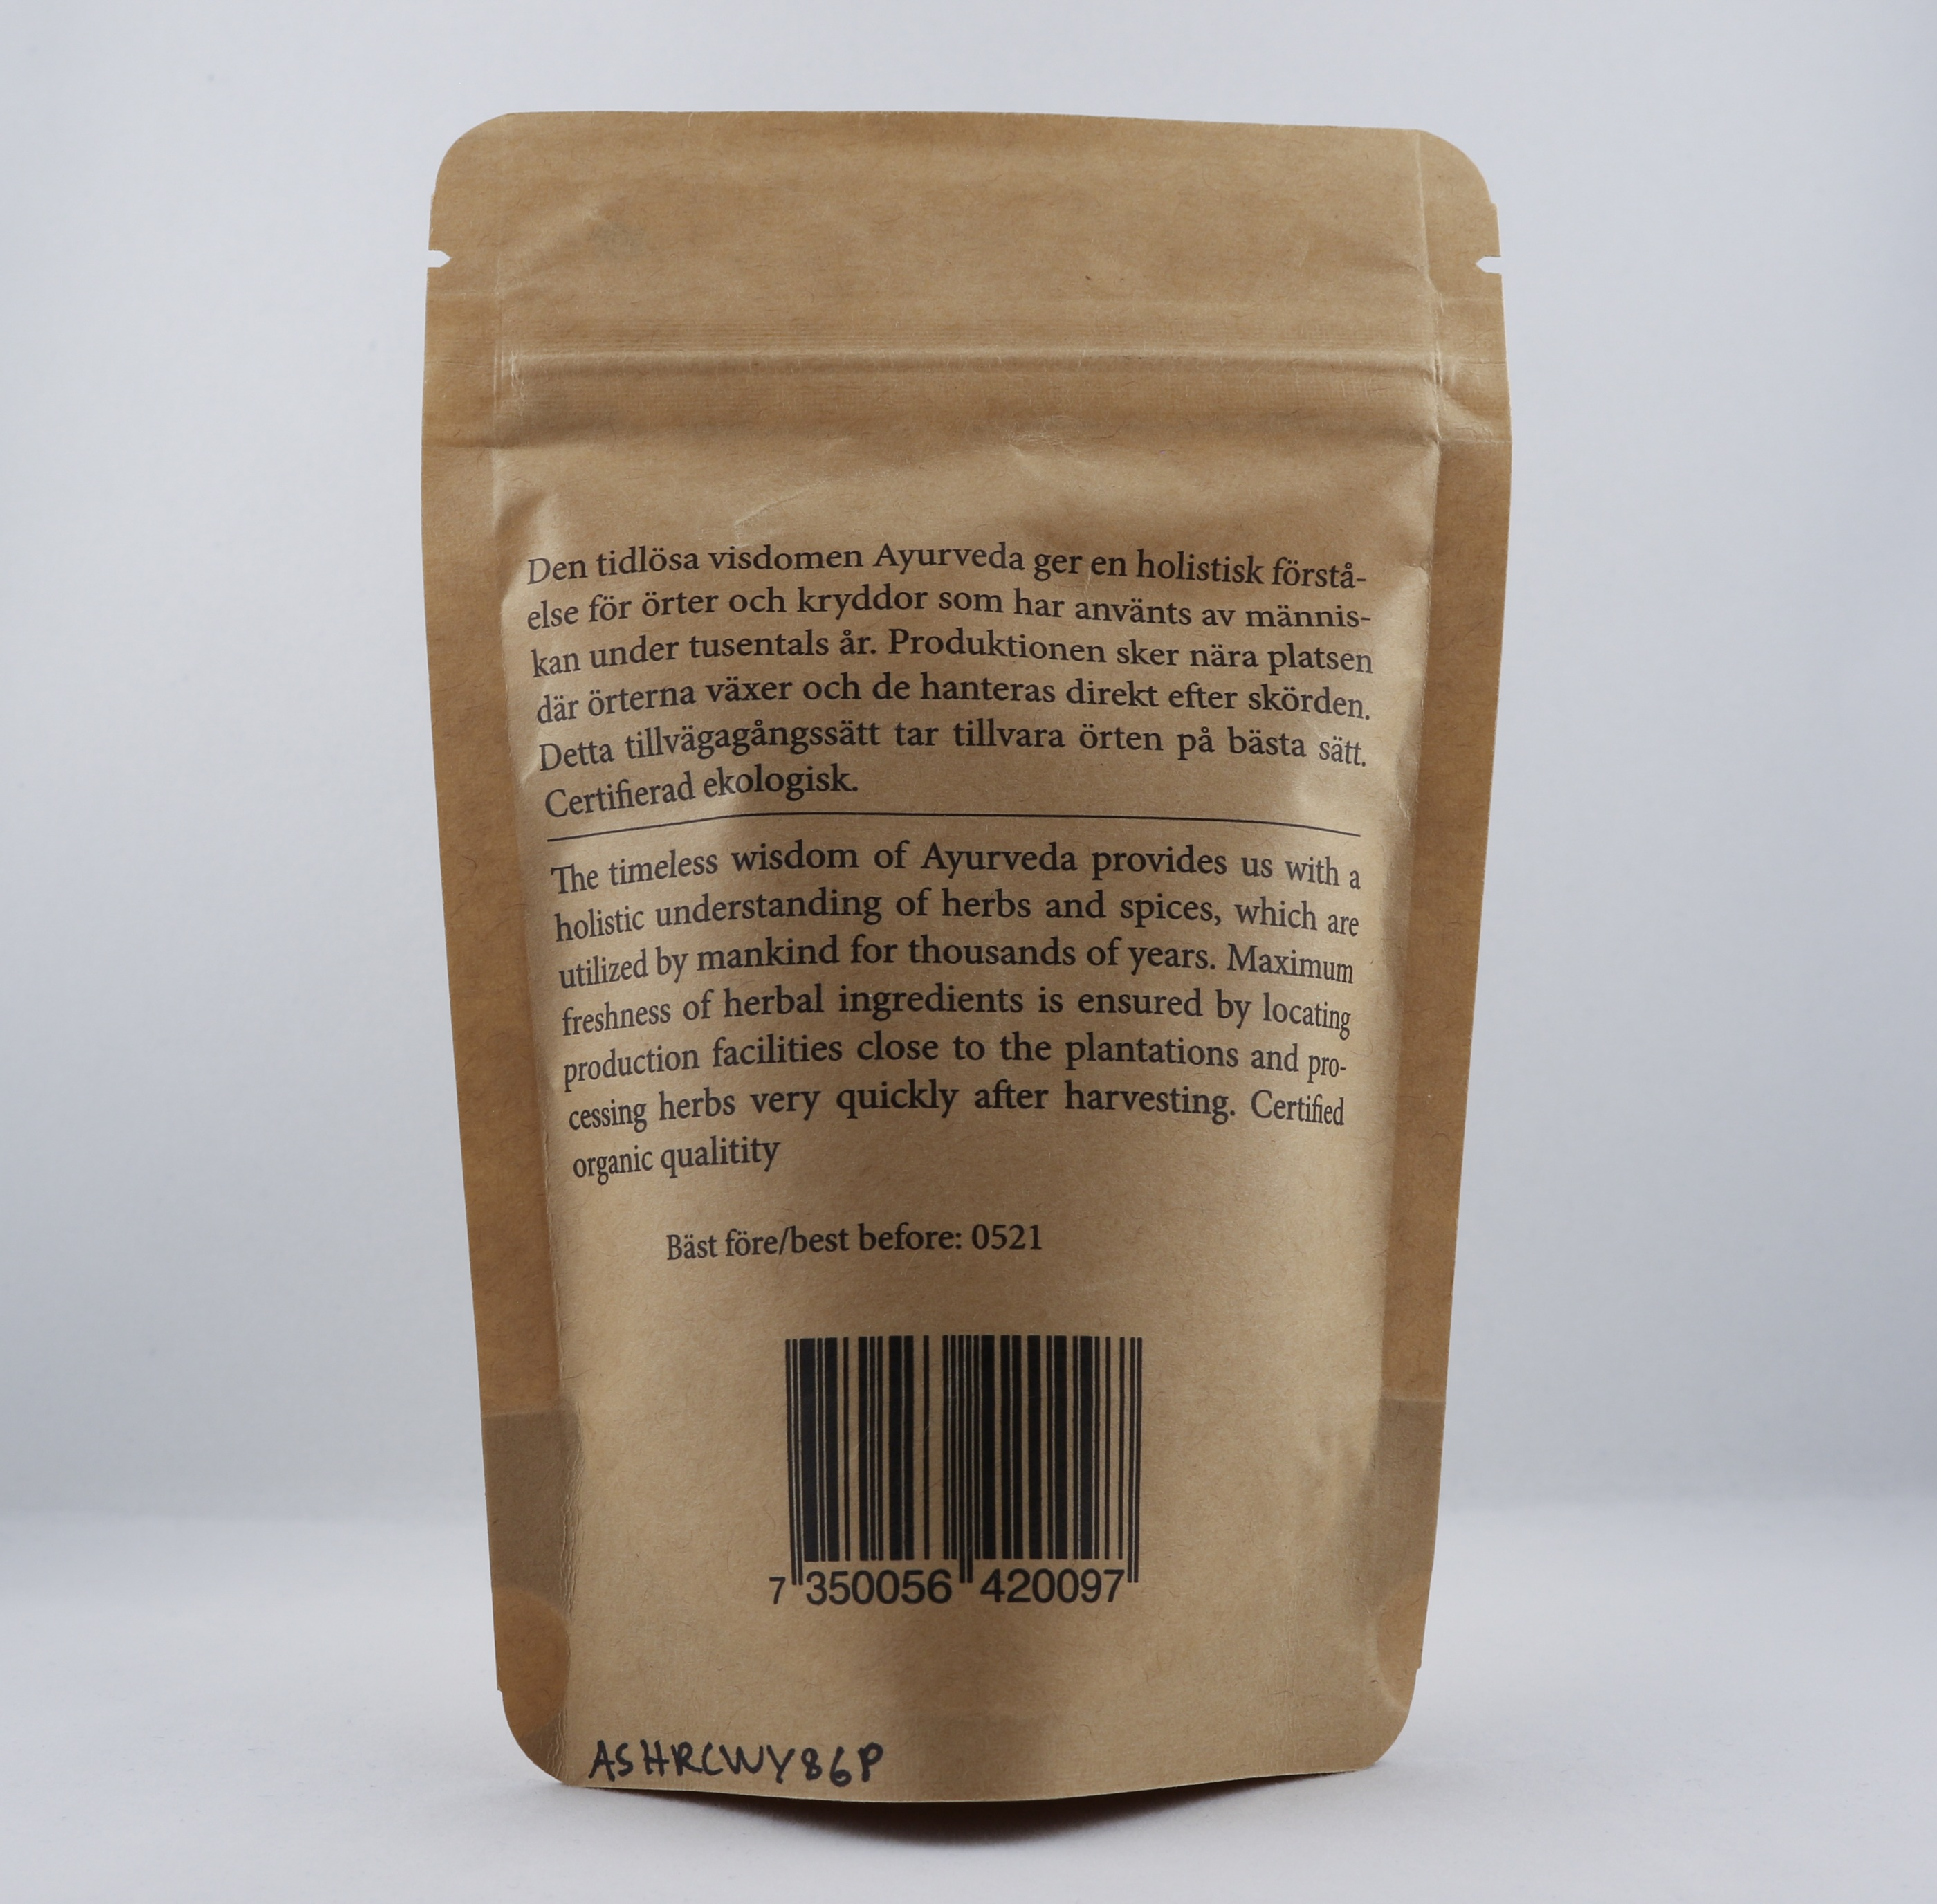 Ashwagandha pulver holistisk homeopati alternativ hälsa eko ekologisk Wellness Ayurveda Halmstadmassören Halmstad Sverige Sweden svensk pulver